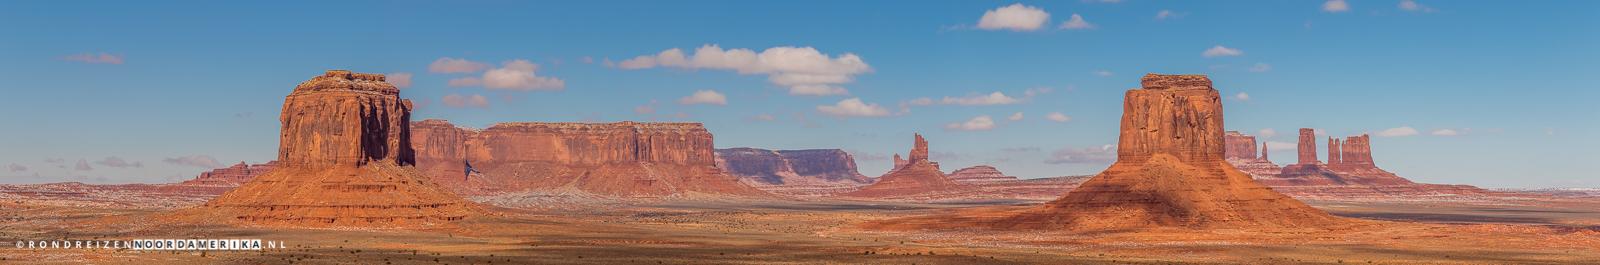 Artist's Point Monument Valley